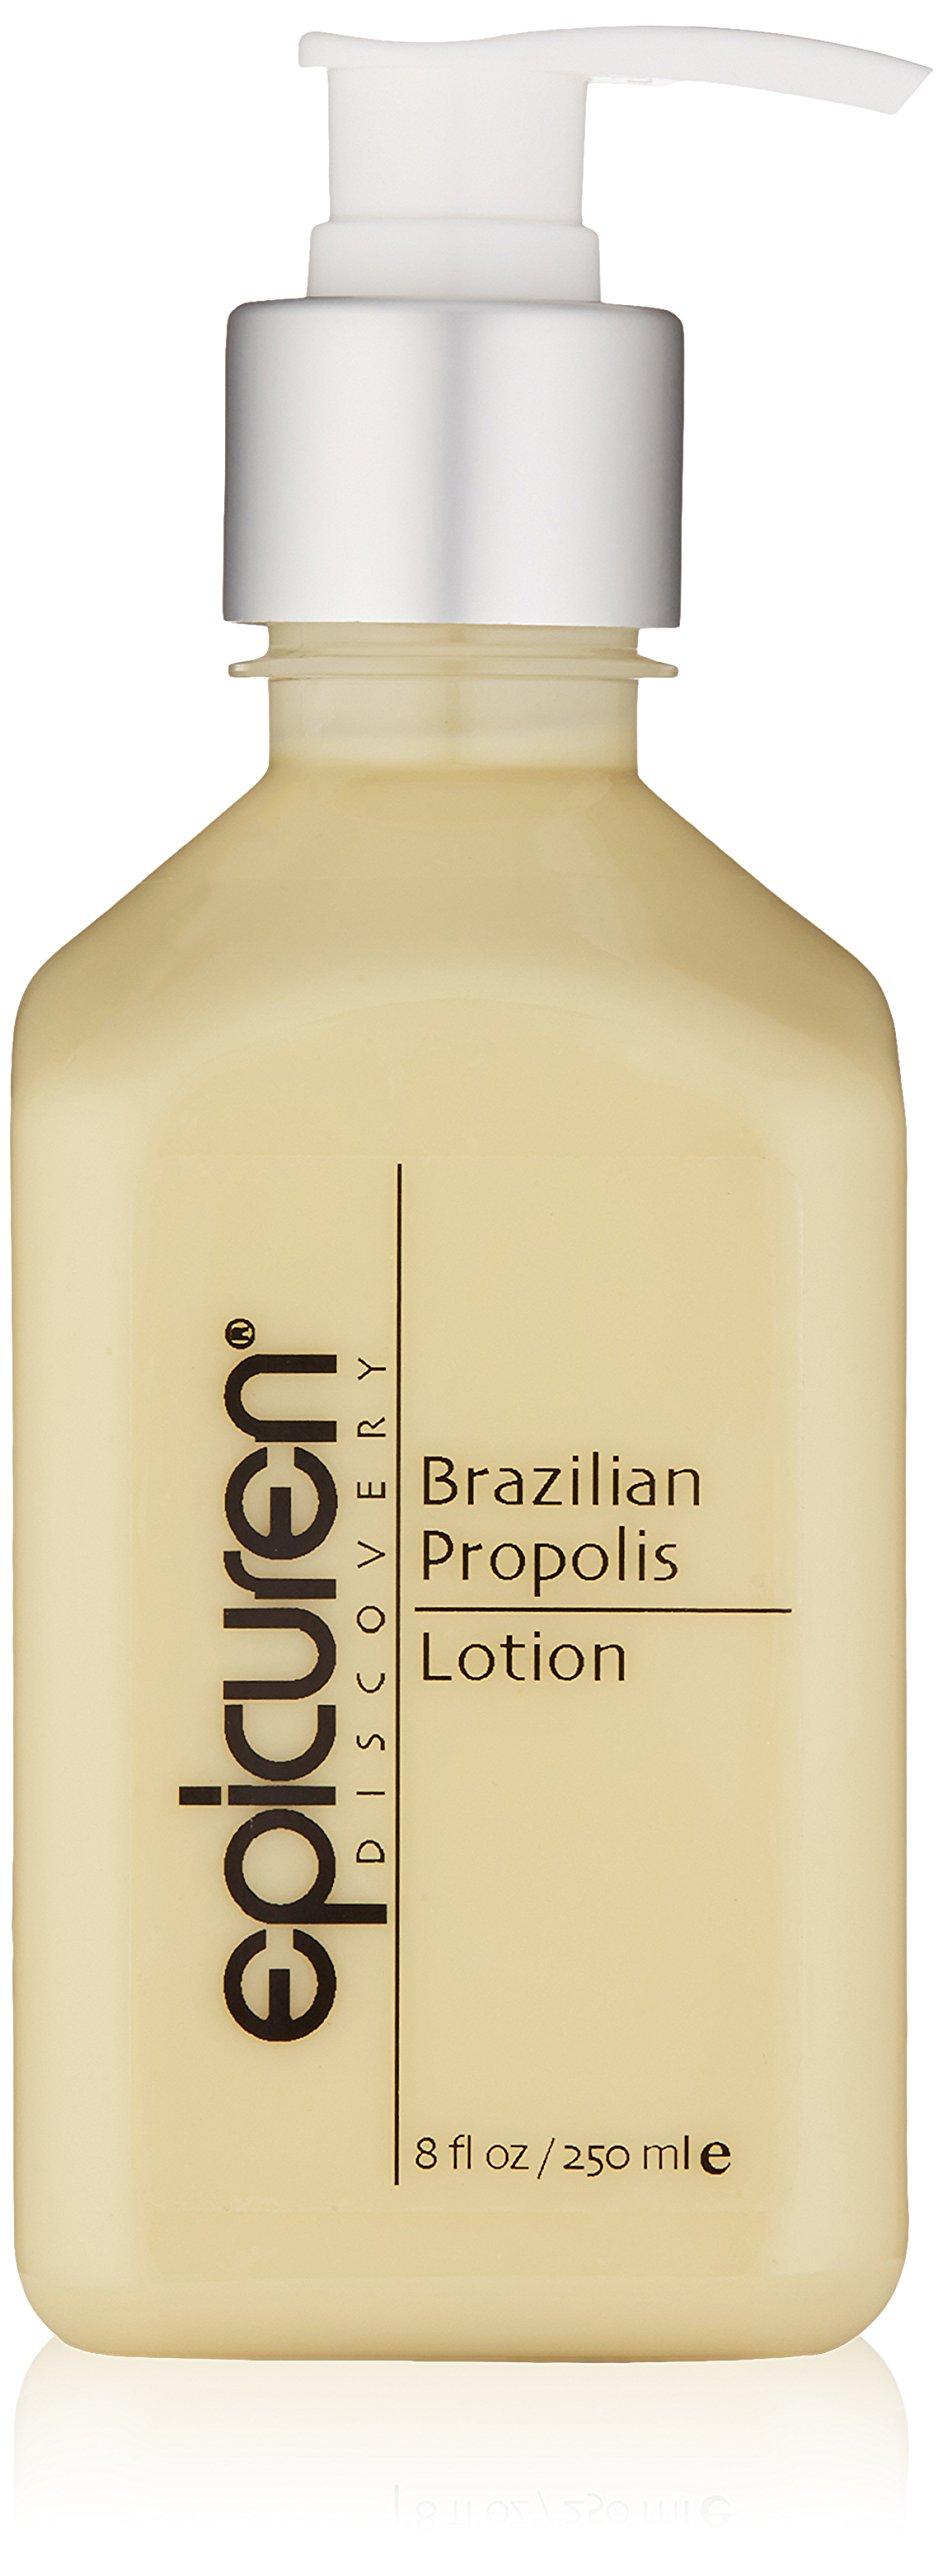 Epicuren Discovery Brazilian Propolis Lotion, 8 Fl oz